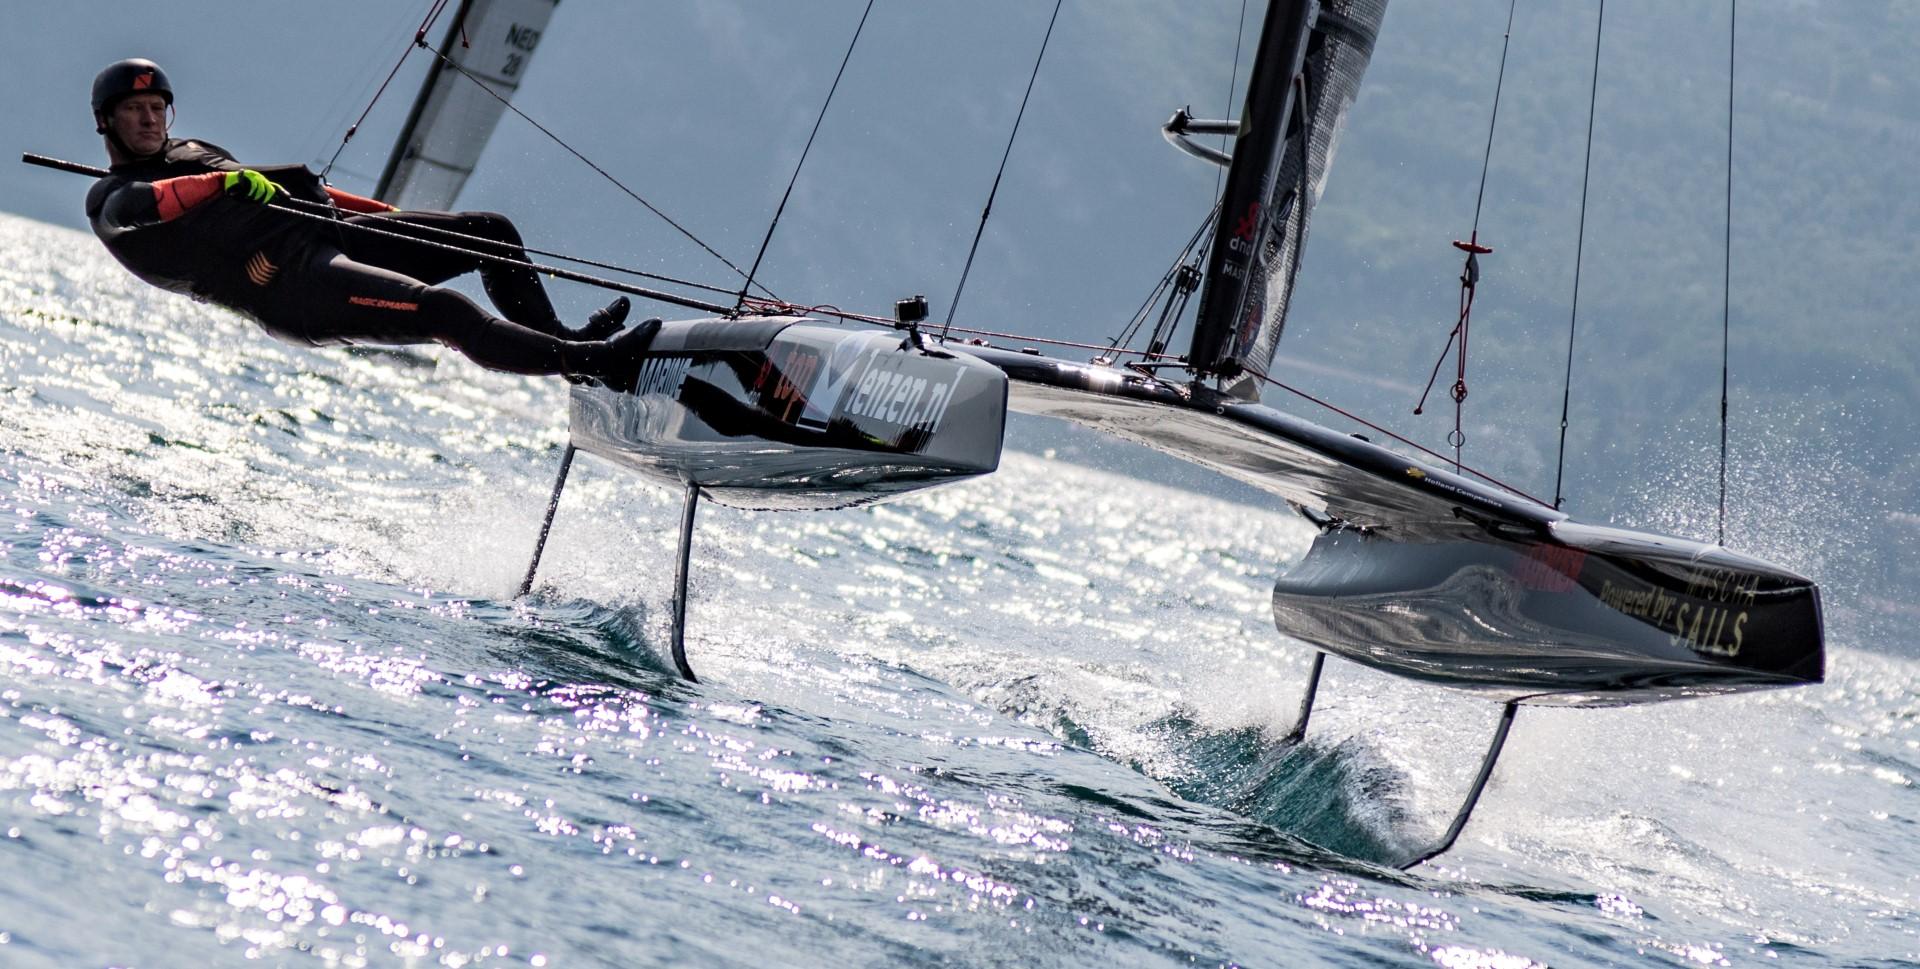 2017-A-class-catamaran-Spring-Cup-Lake-Garda-DNA-F1_2 freigegeben für Fitbleibenmitsegeln.de